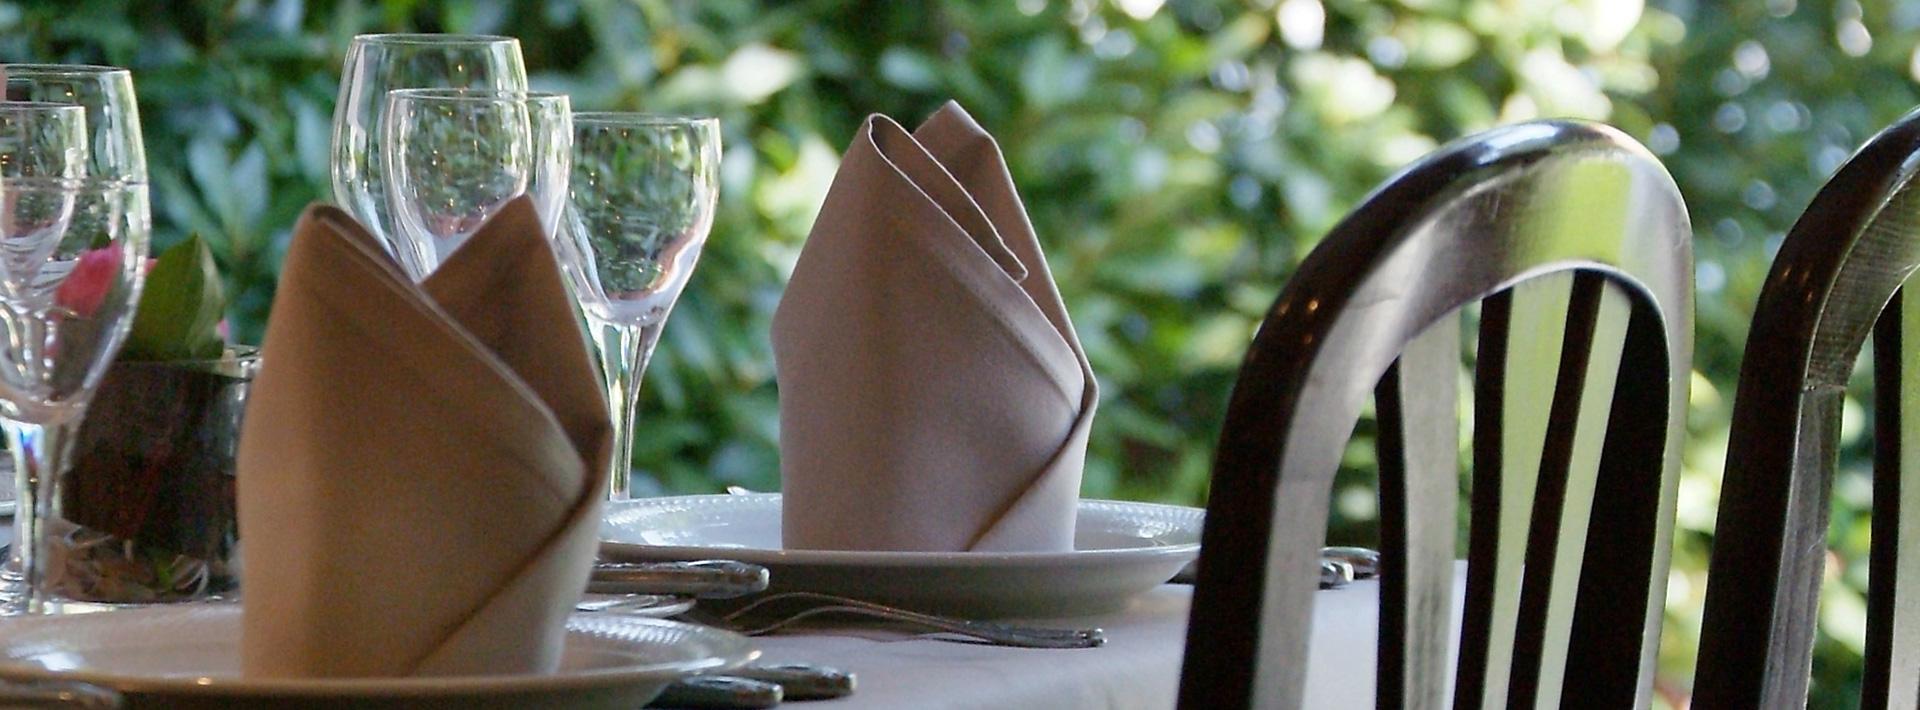 restaurant-malpertus-in-st-niklaas_DSCF3008